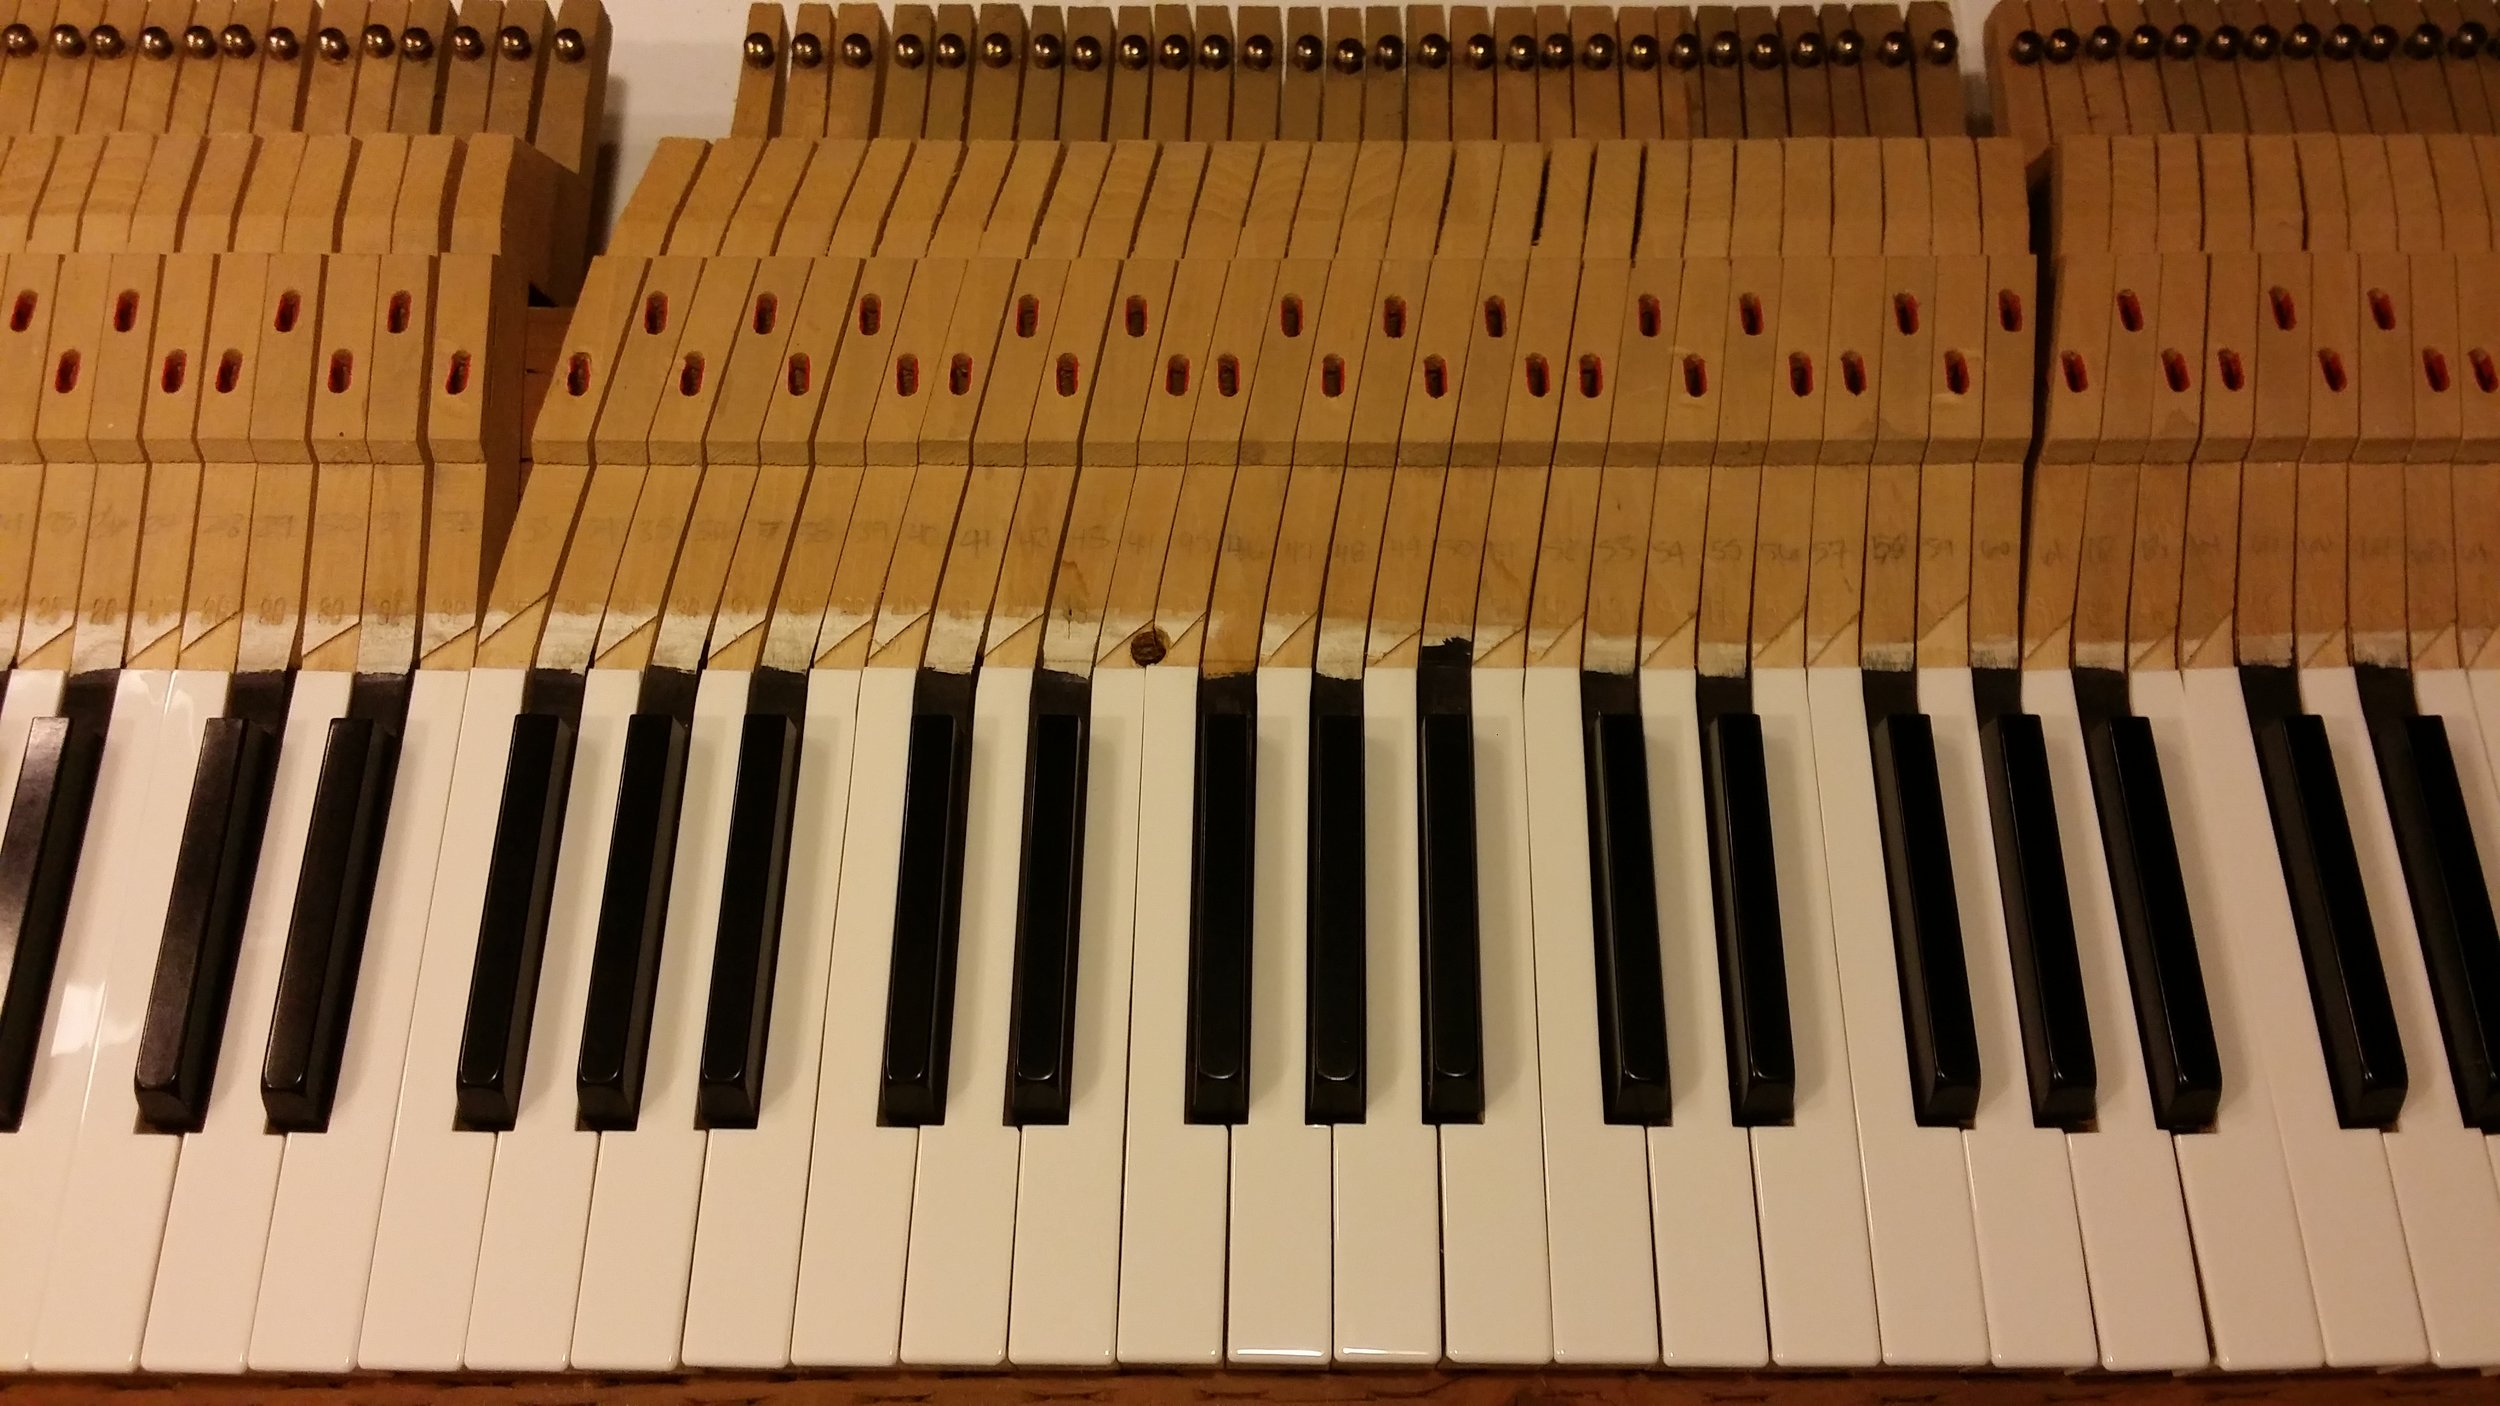 New Keytops Ready for Installation